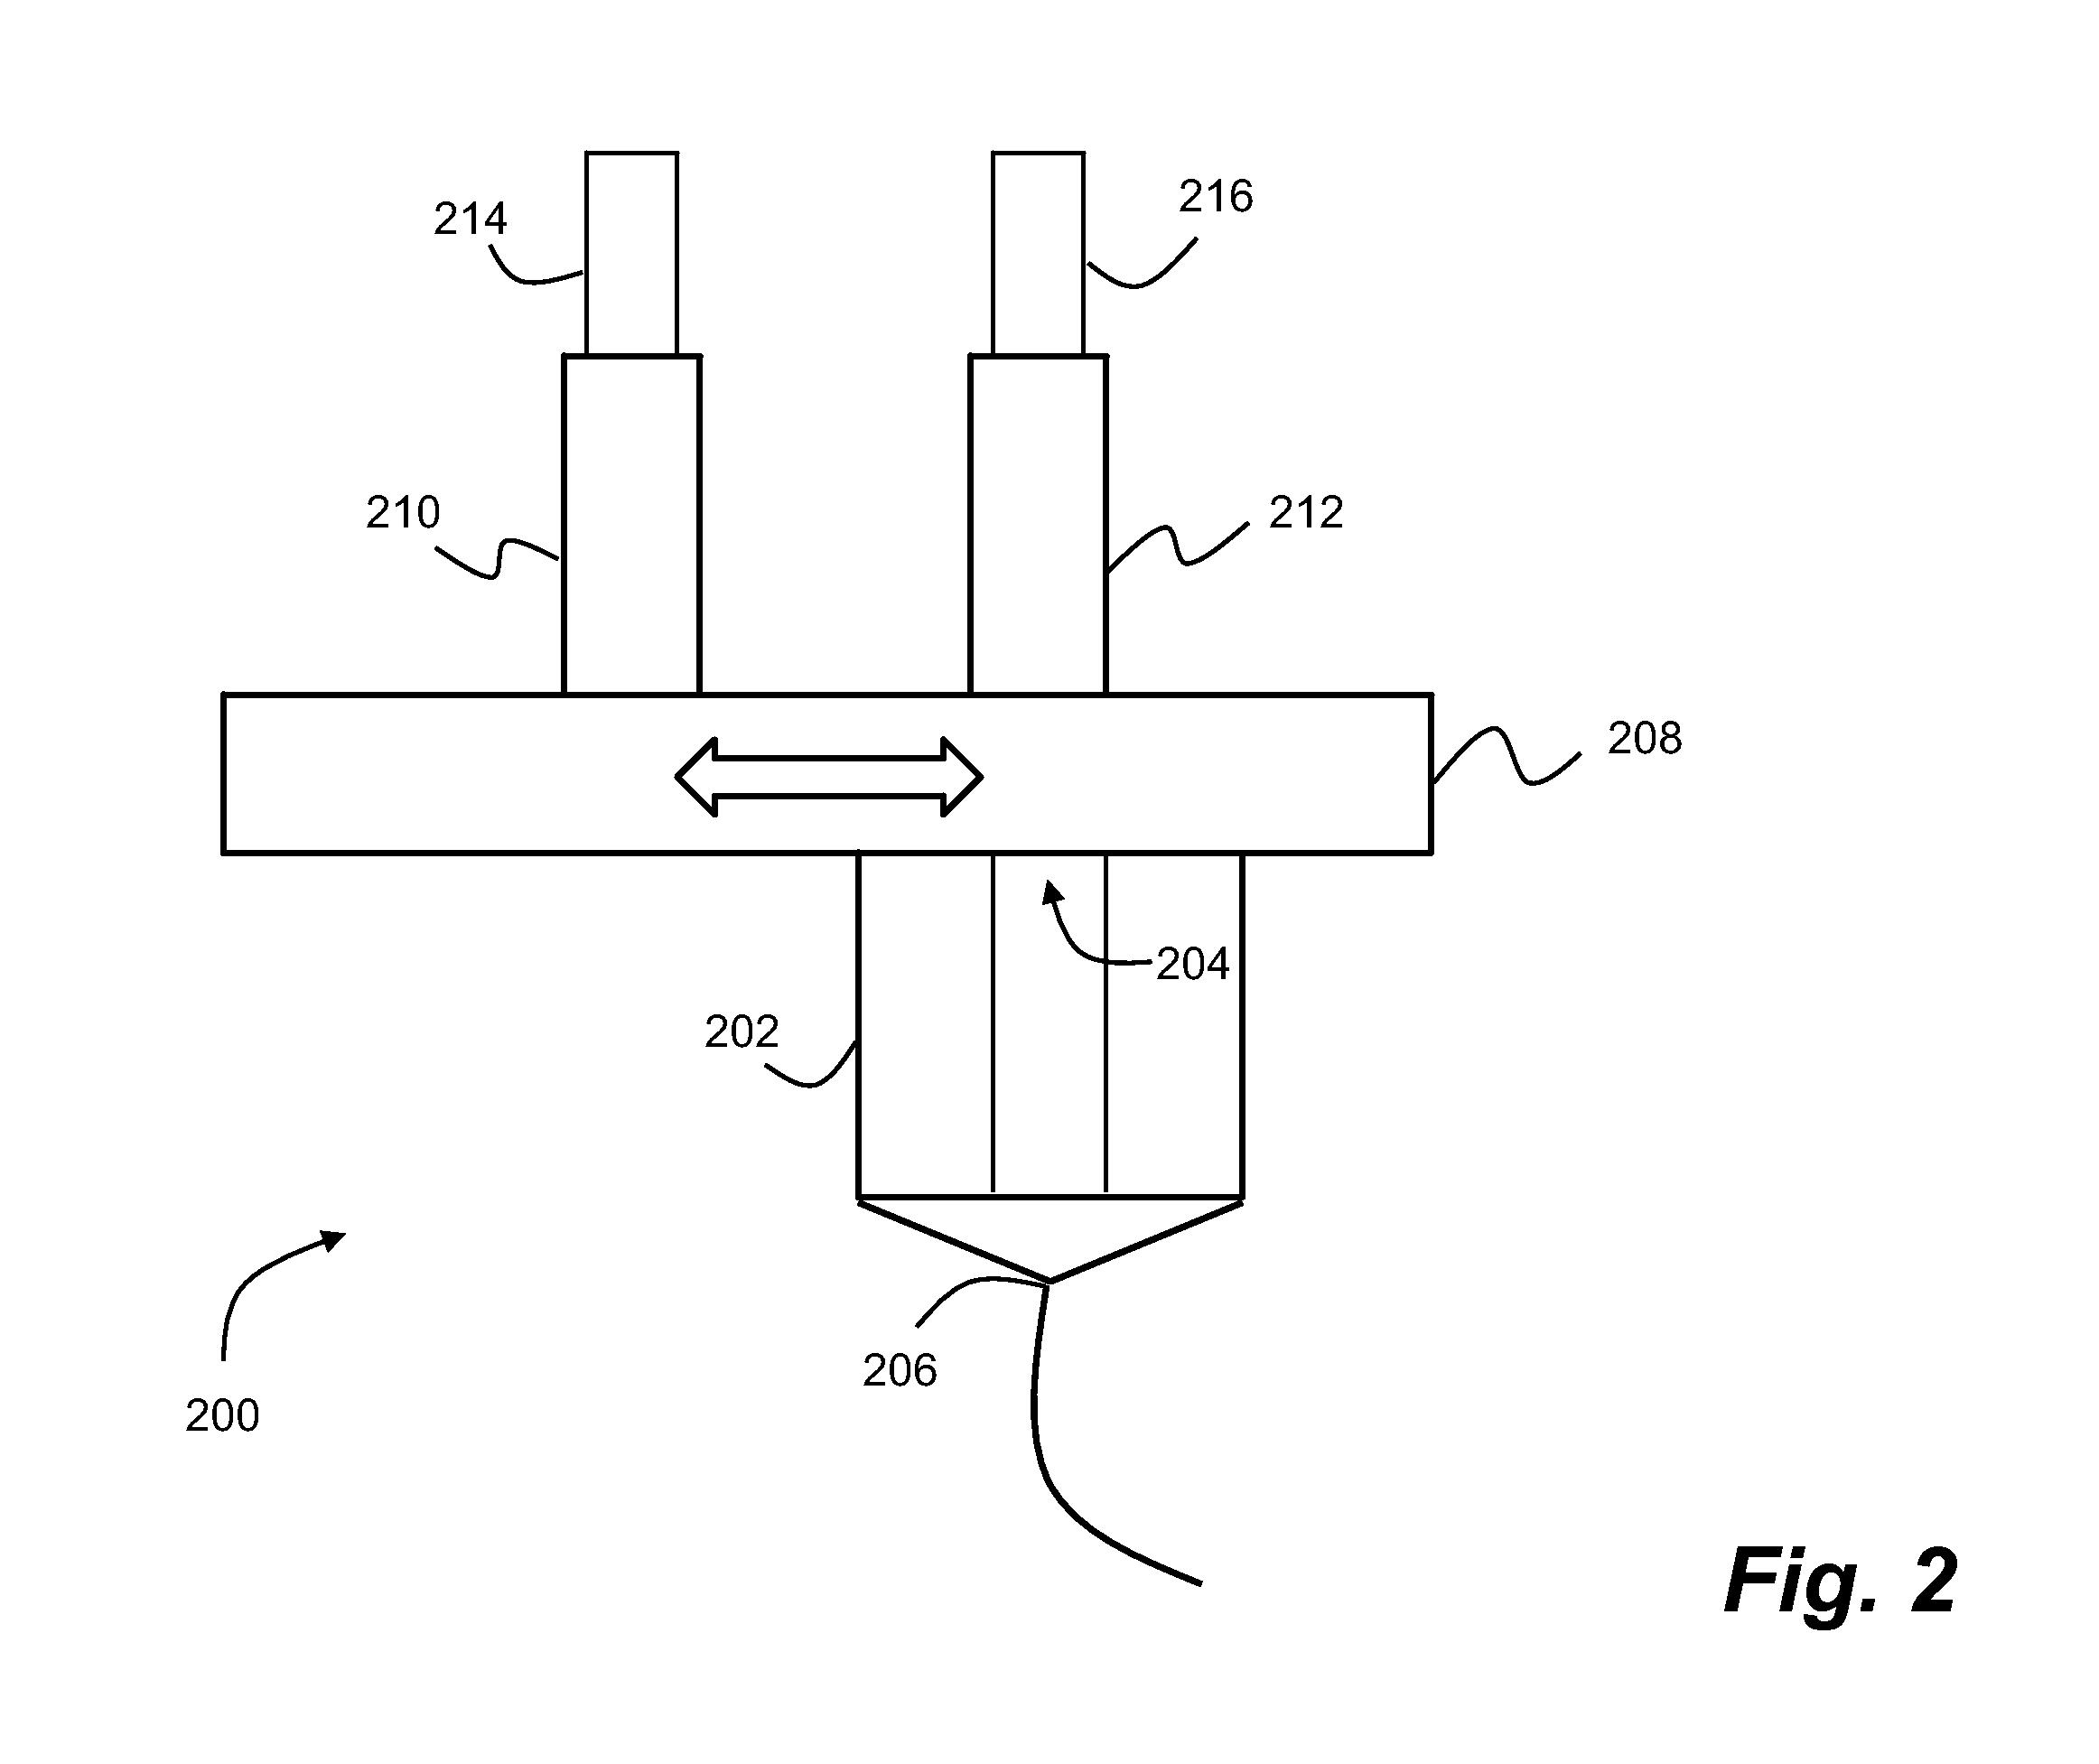 MakerBot Files MultiHead Printer Patent > ENGINEERING.com